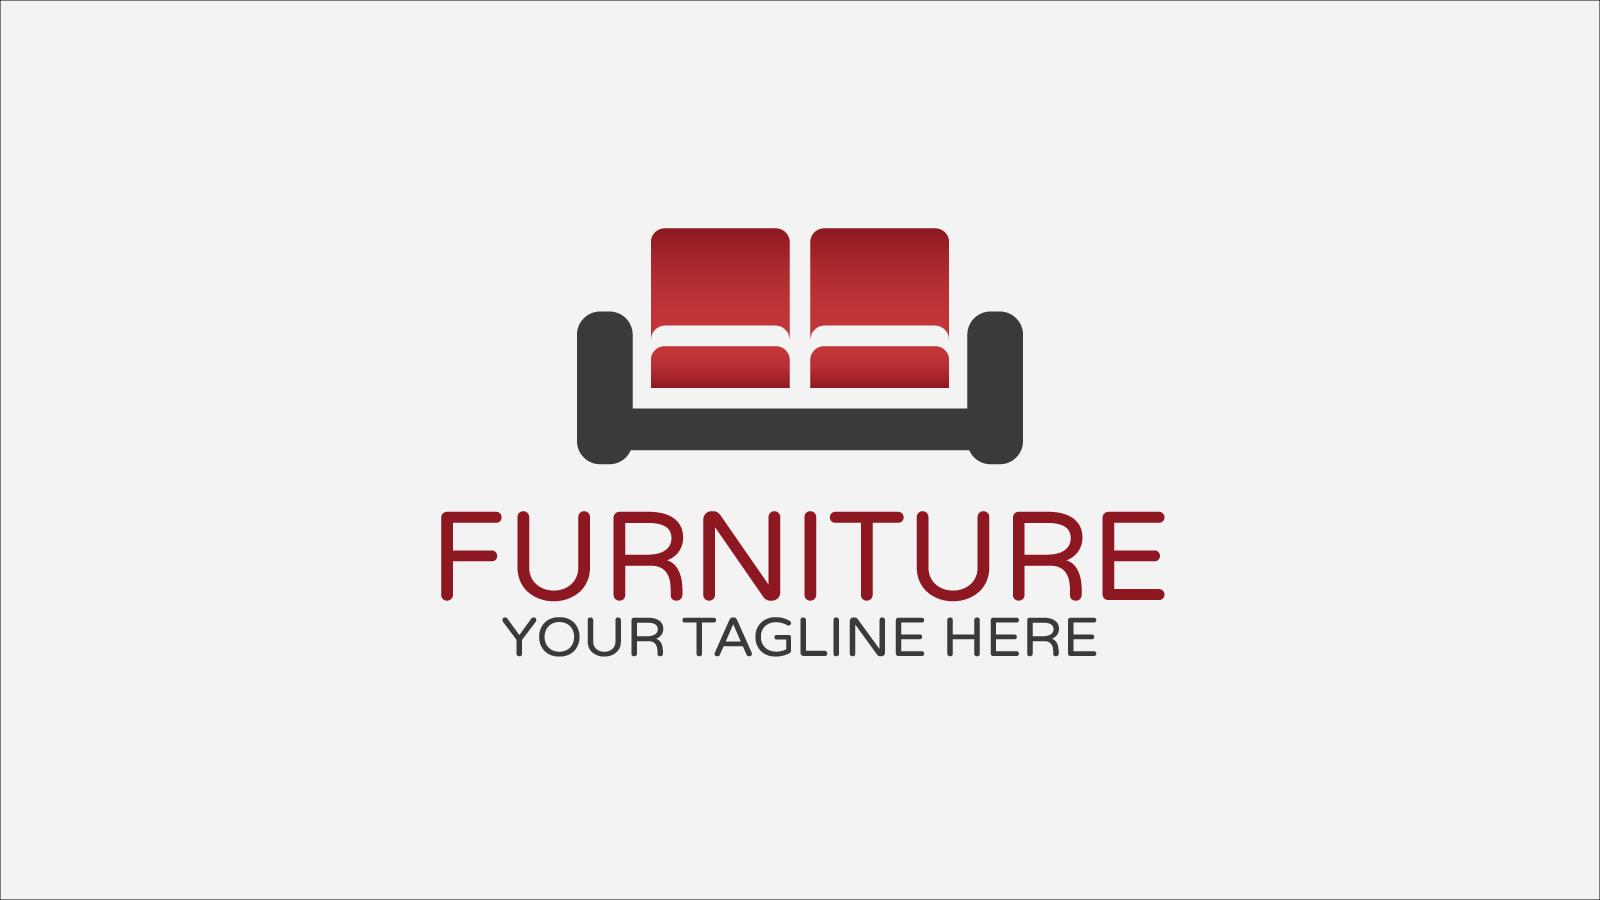 Furniture free logo design zfreegraphic free vector logo downloads furniture free business logo design template interior wajeb Gallery